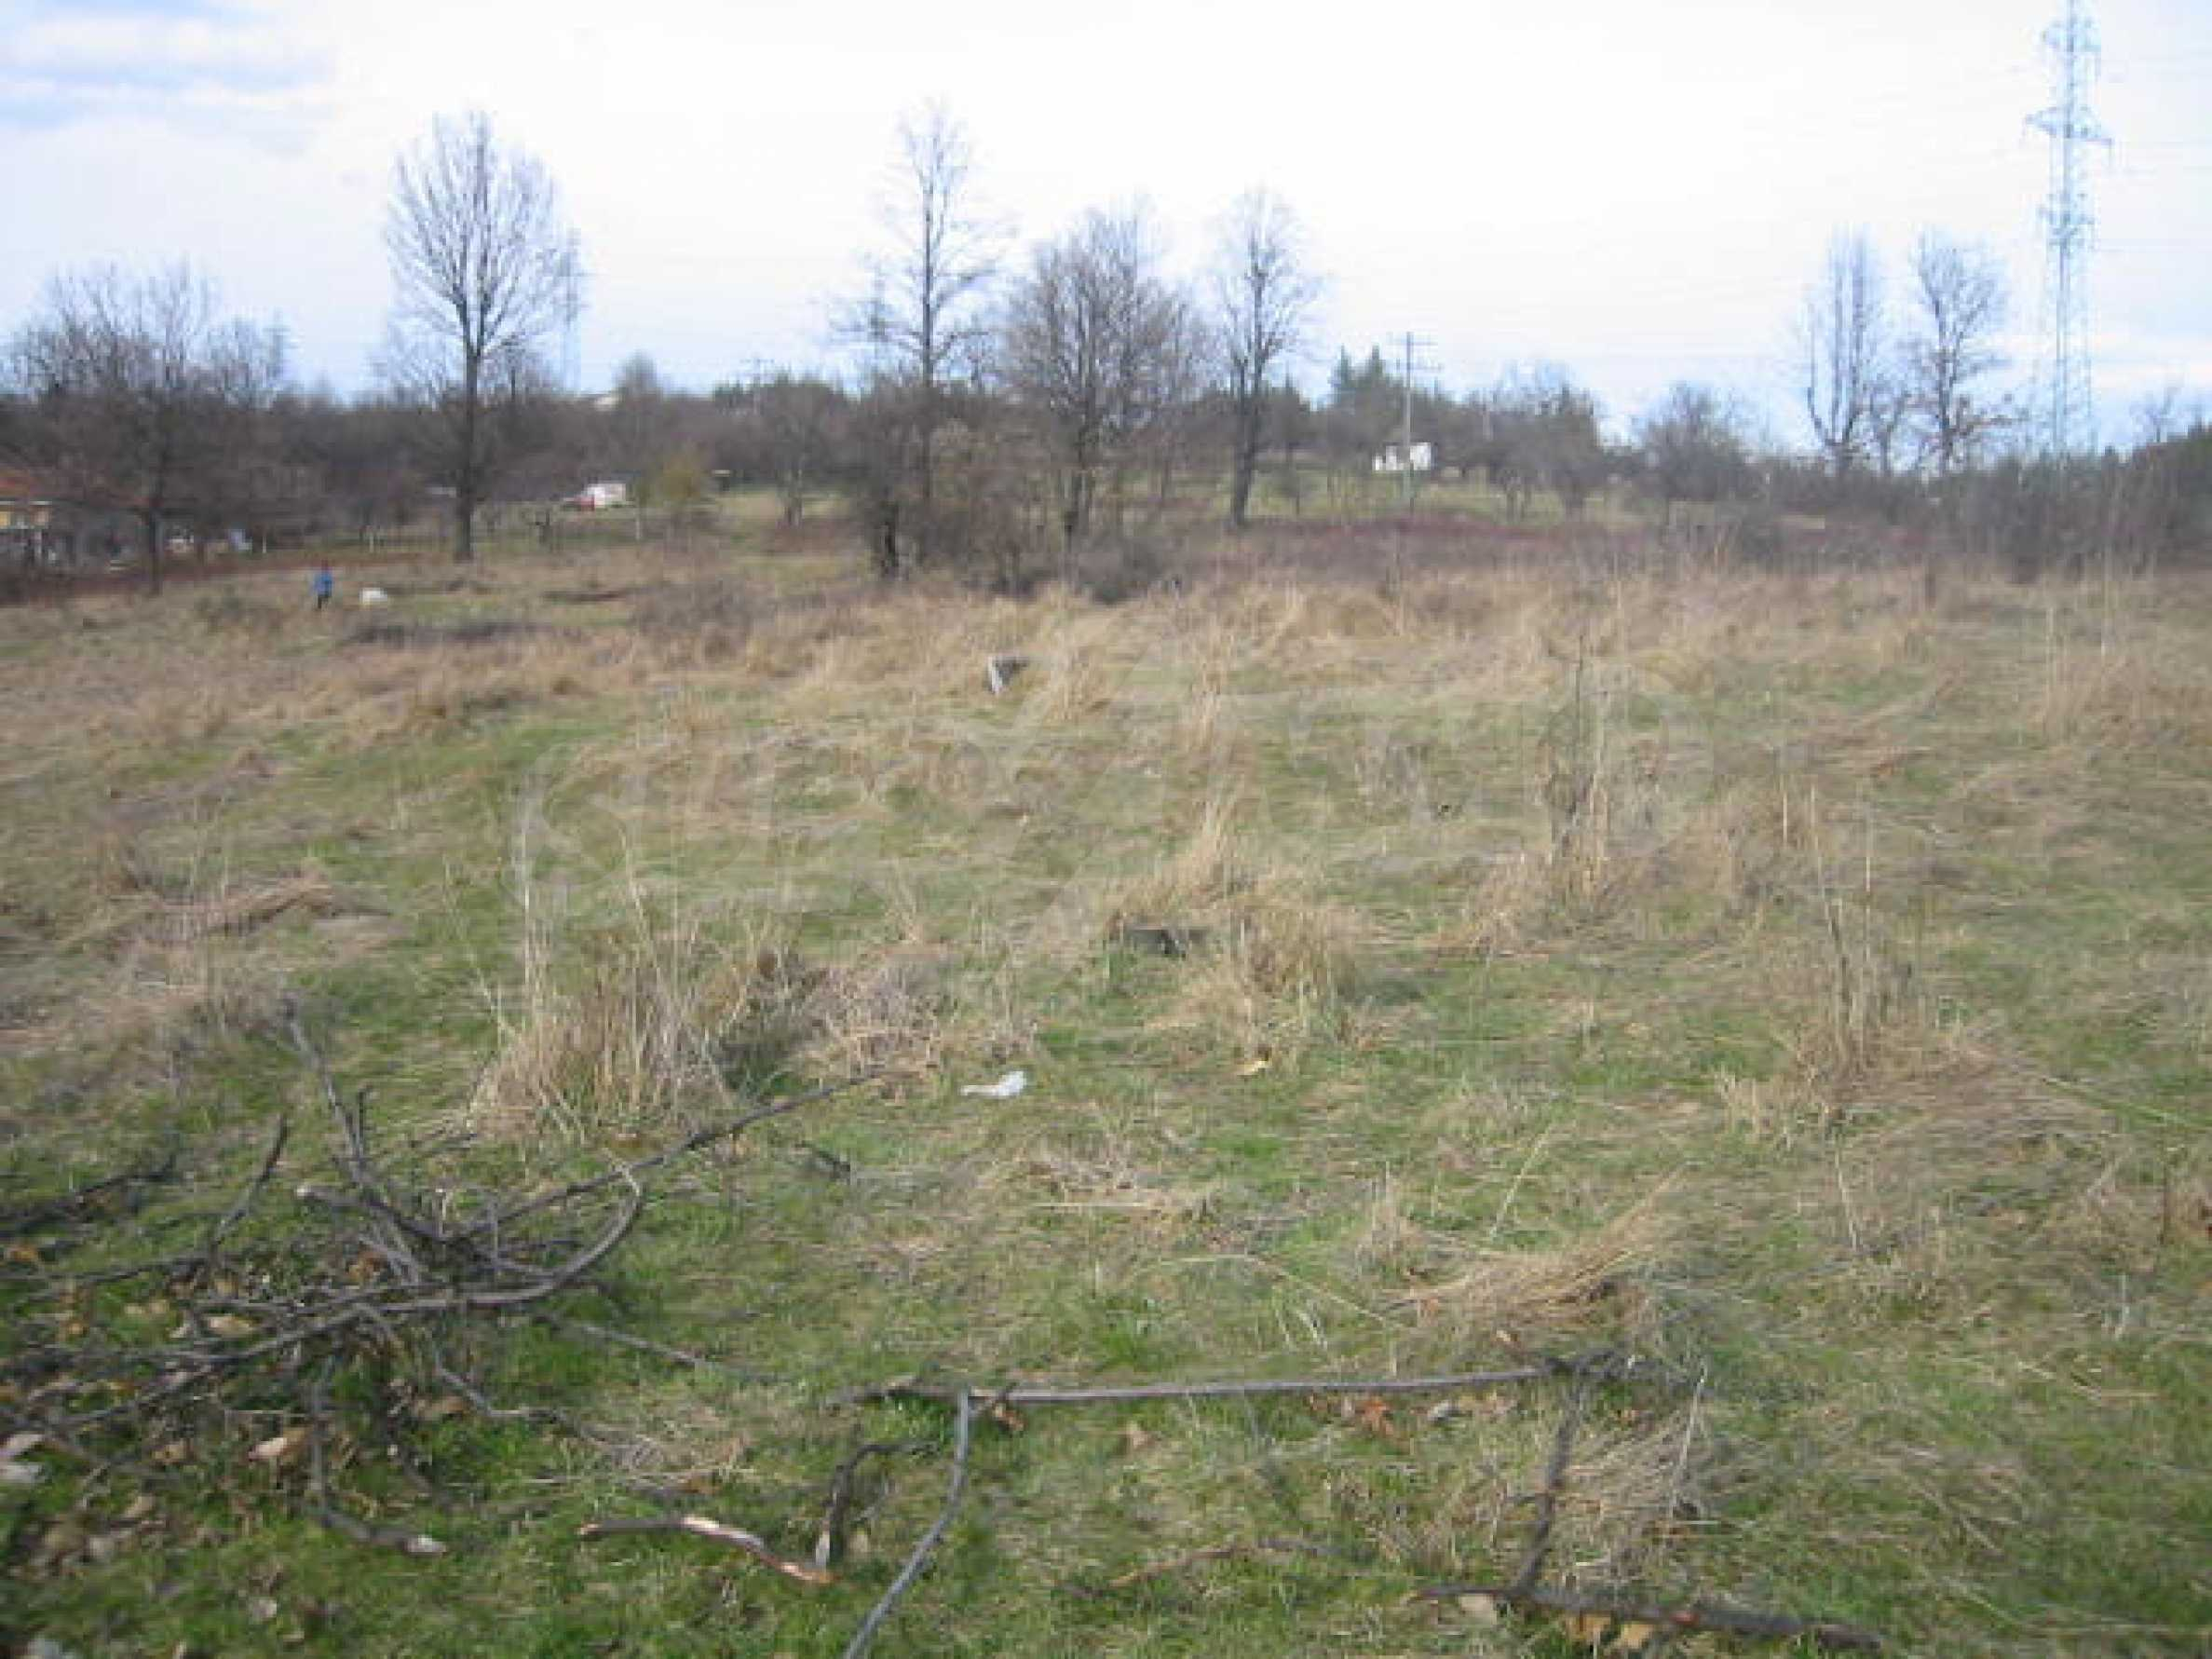 A plot of land